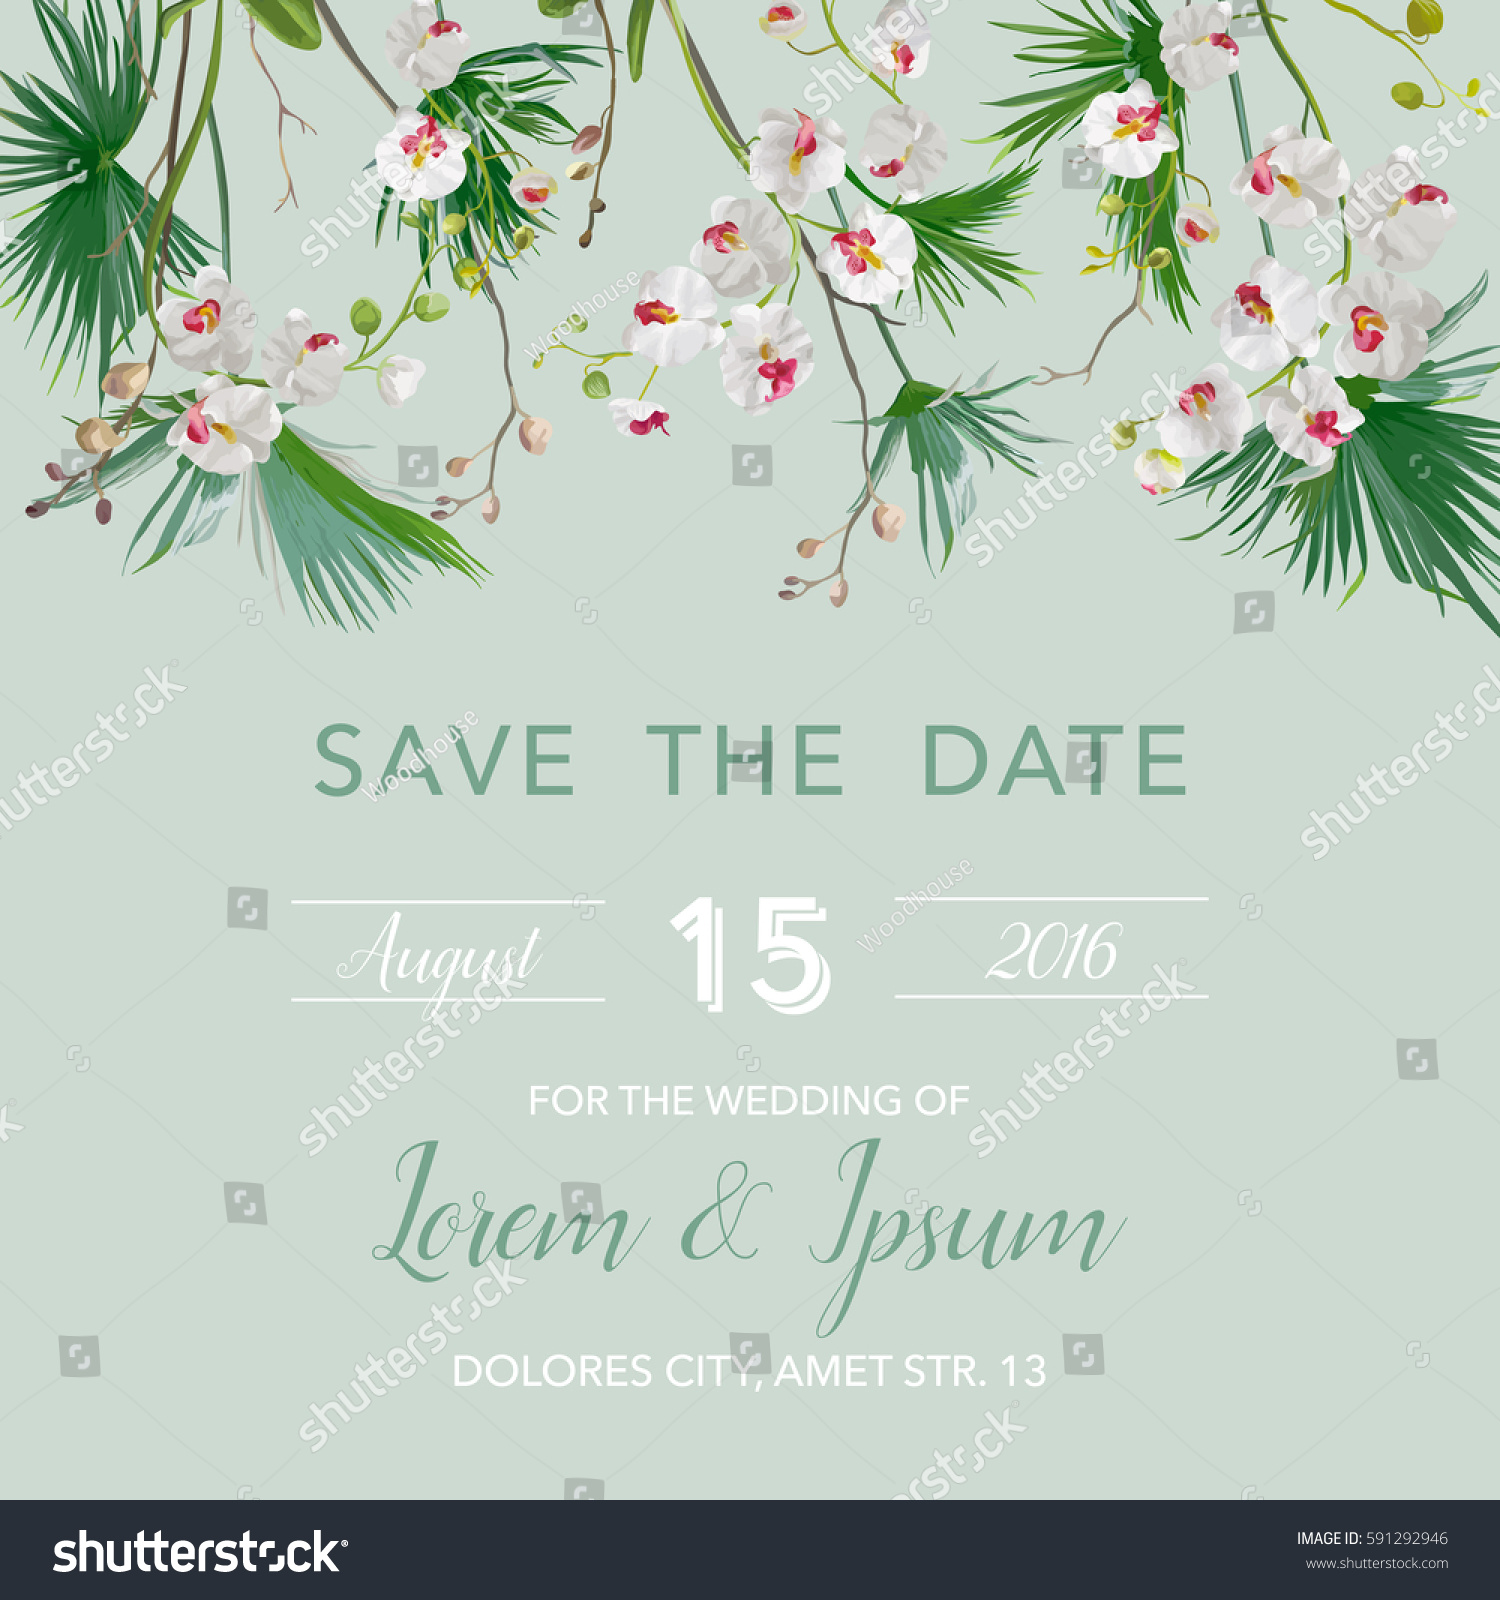 Save Date Wedding Card Tropical Theme Stock Vector 591292946 ...